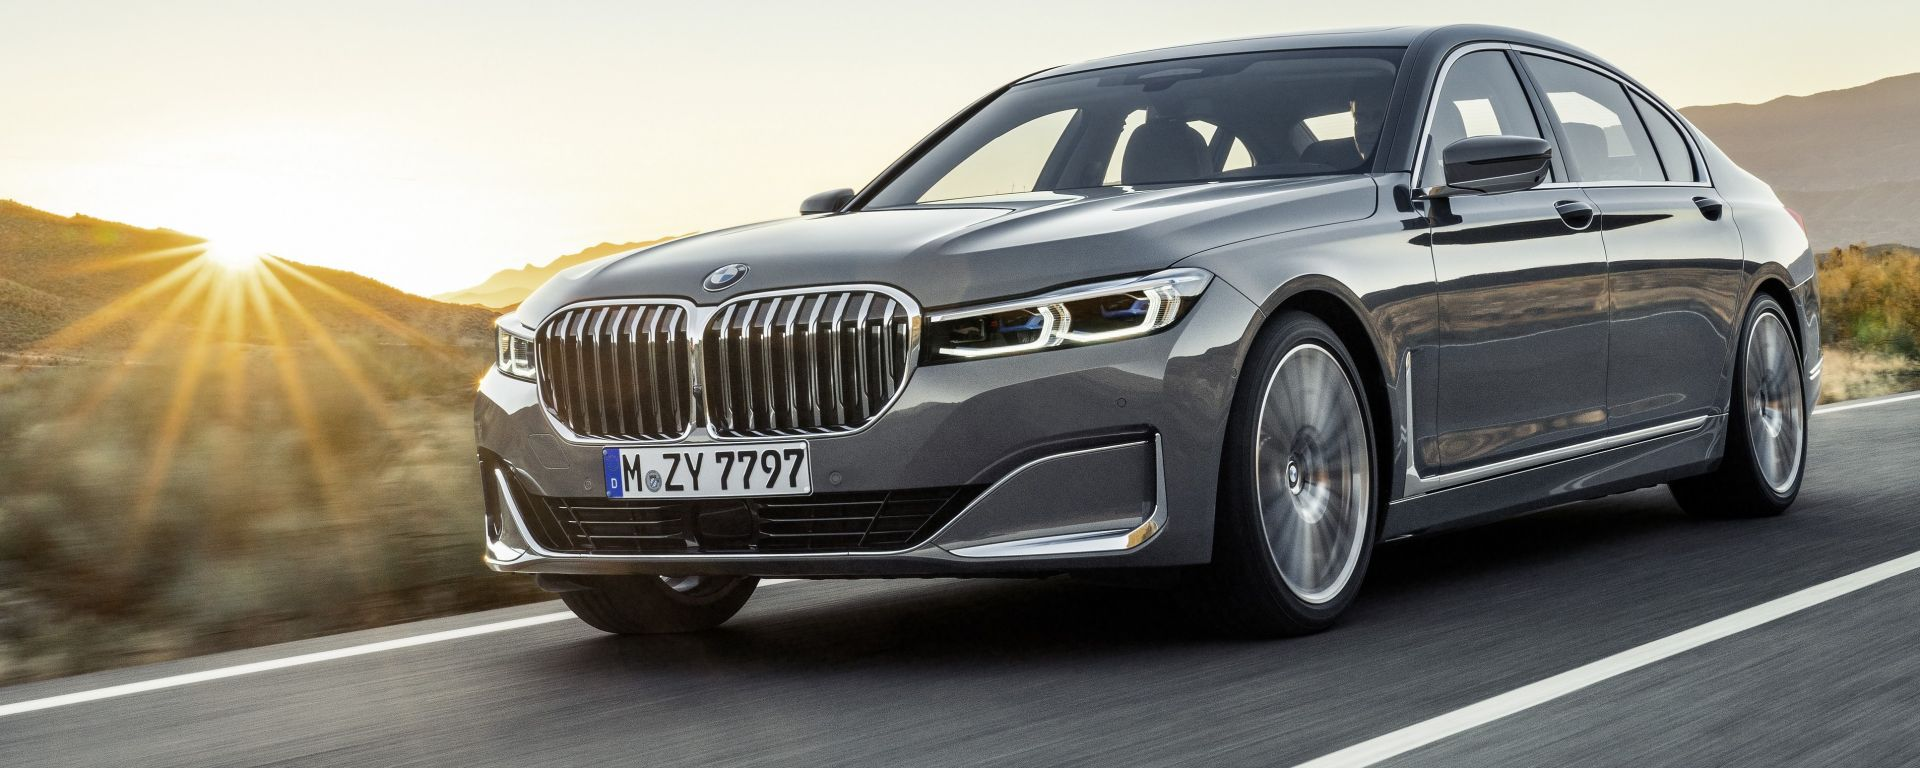 BMW Serie 7 restyling: foto e info ufficiali